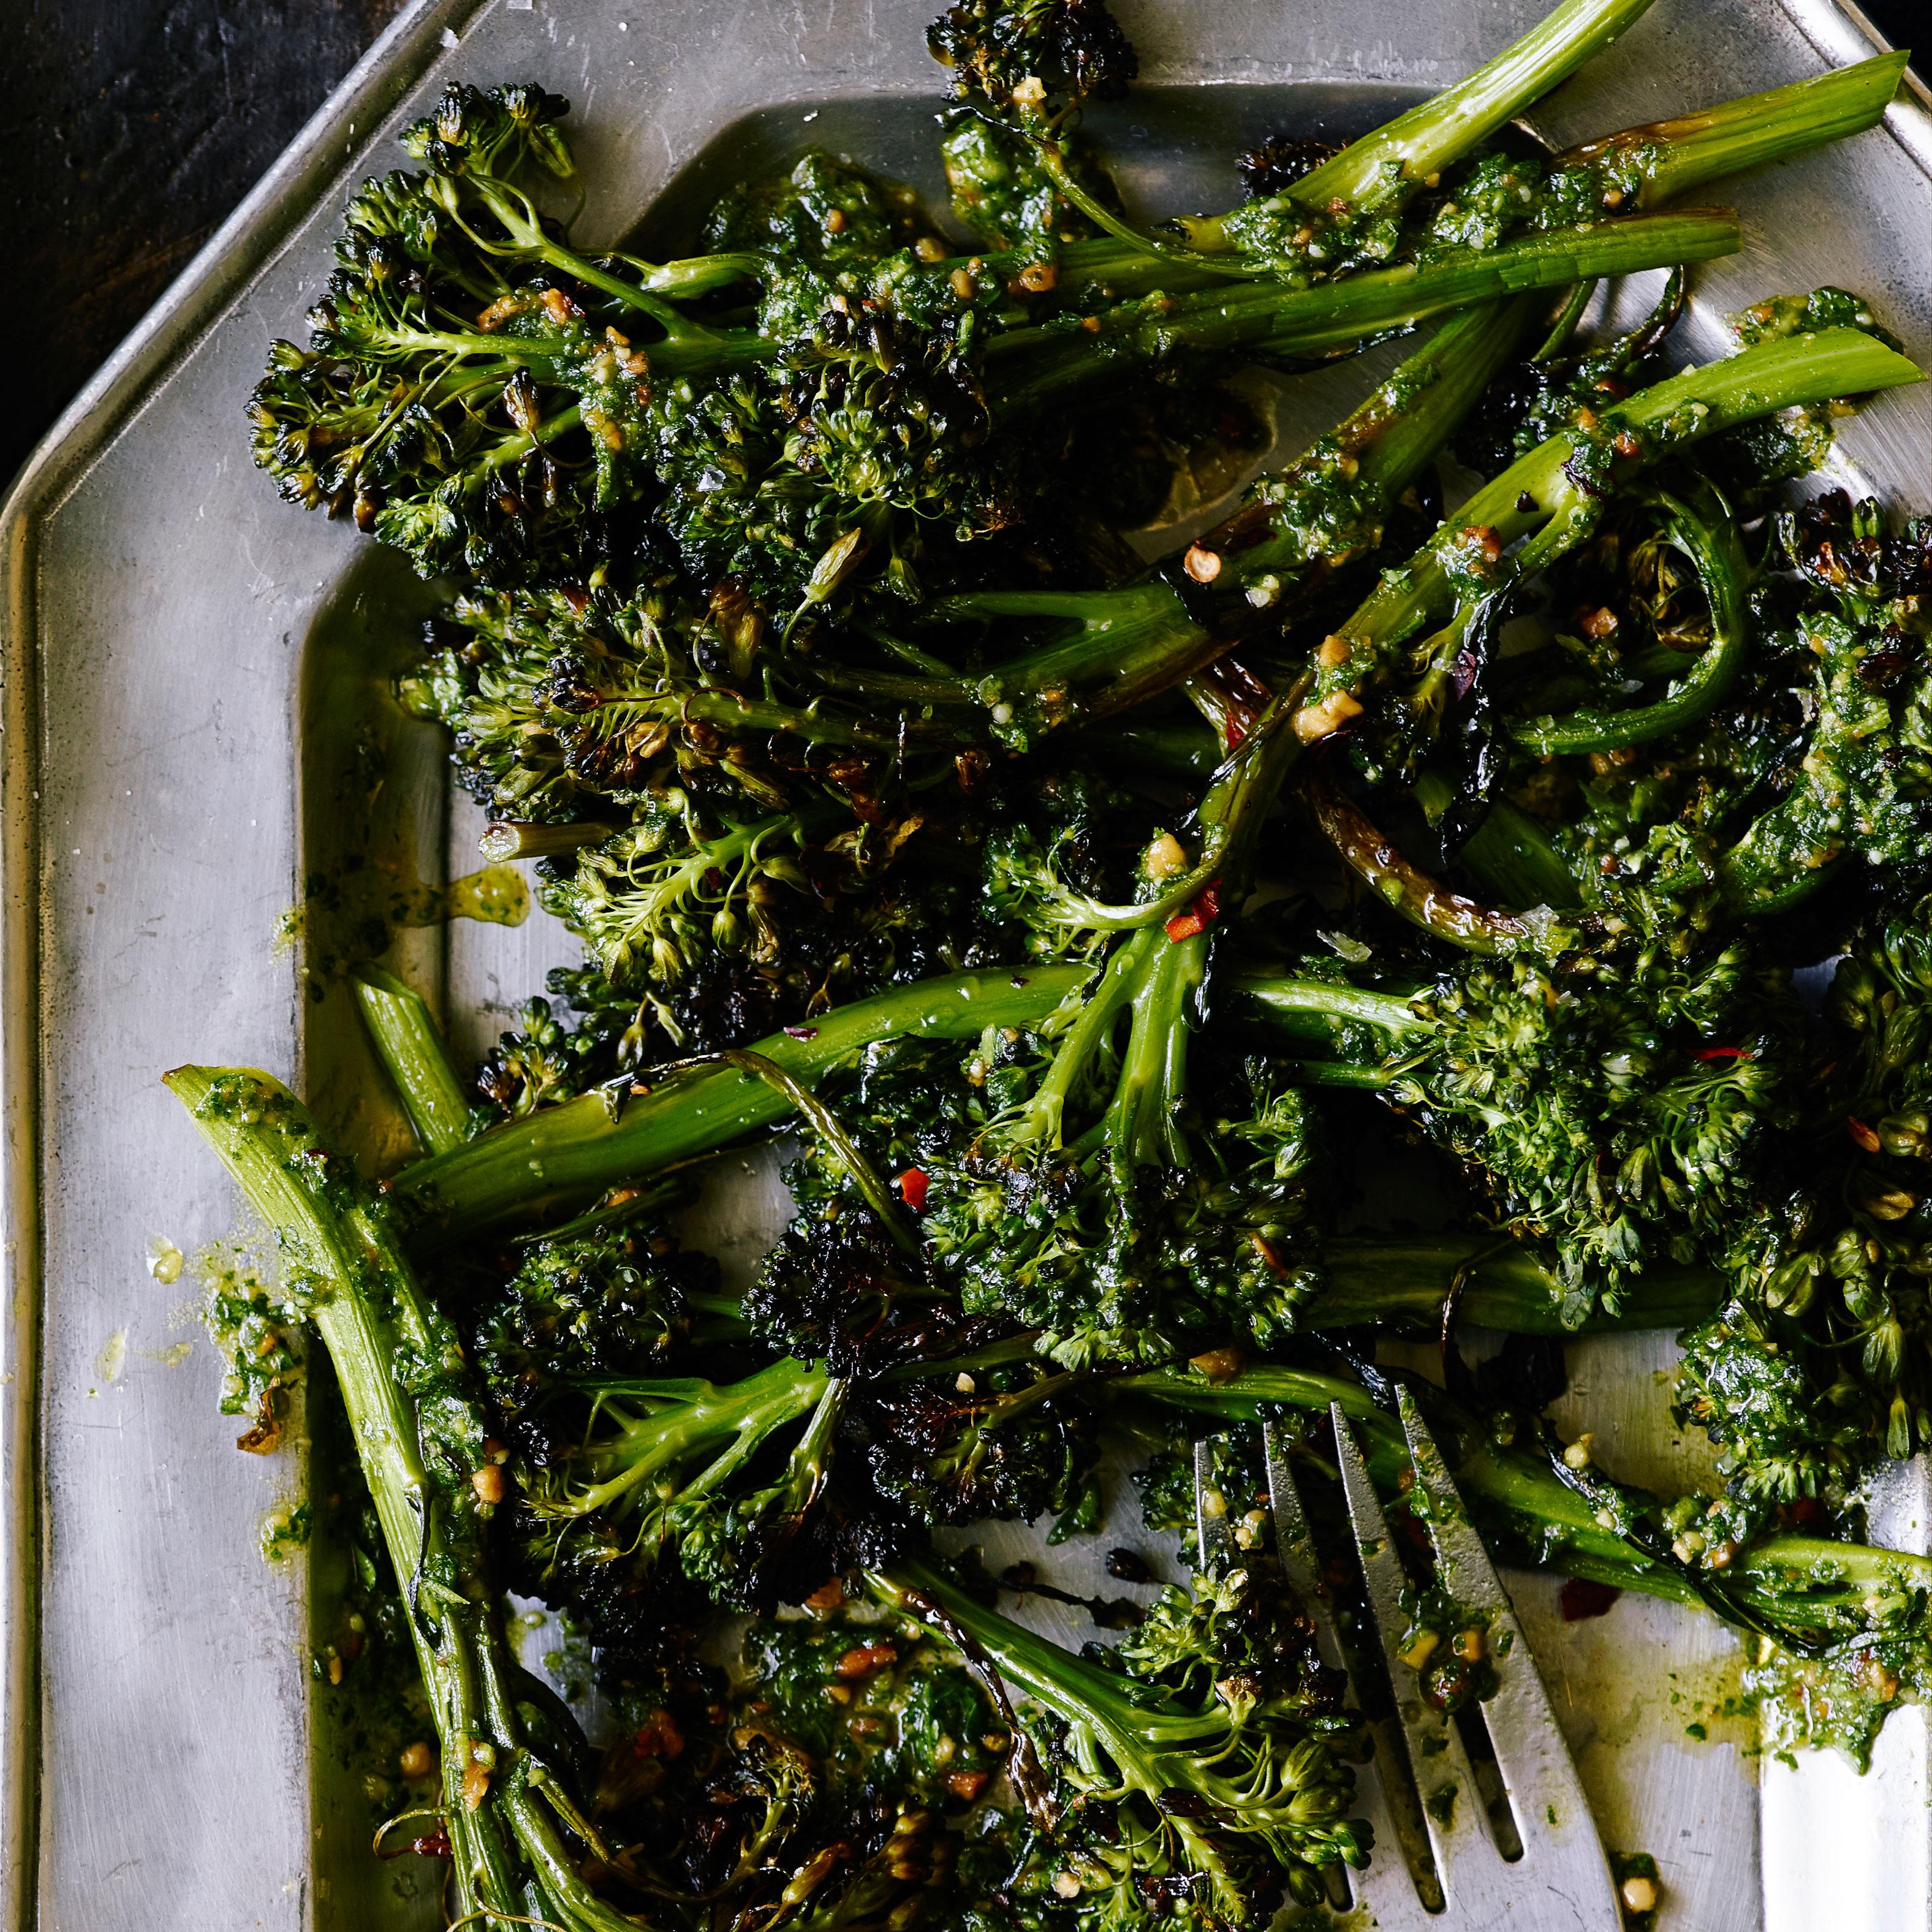 su-Roasted Broccolini with Almond Parsley Pesto Image